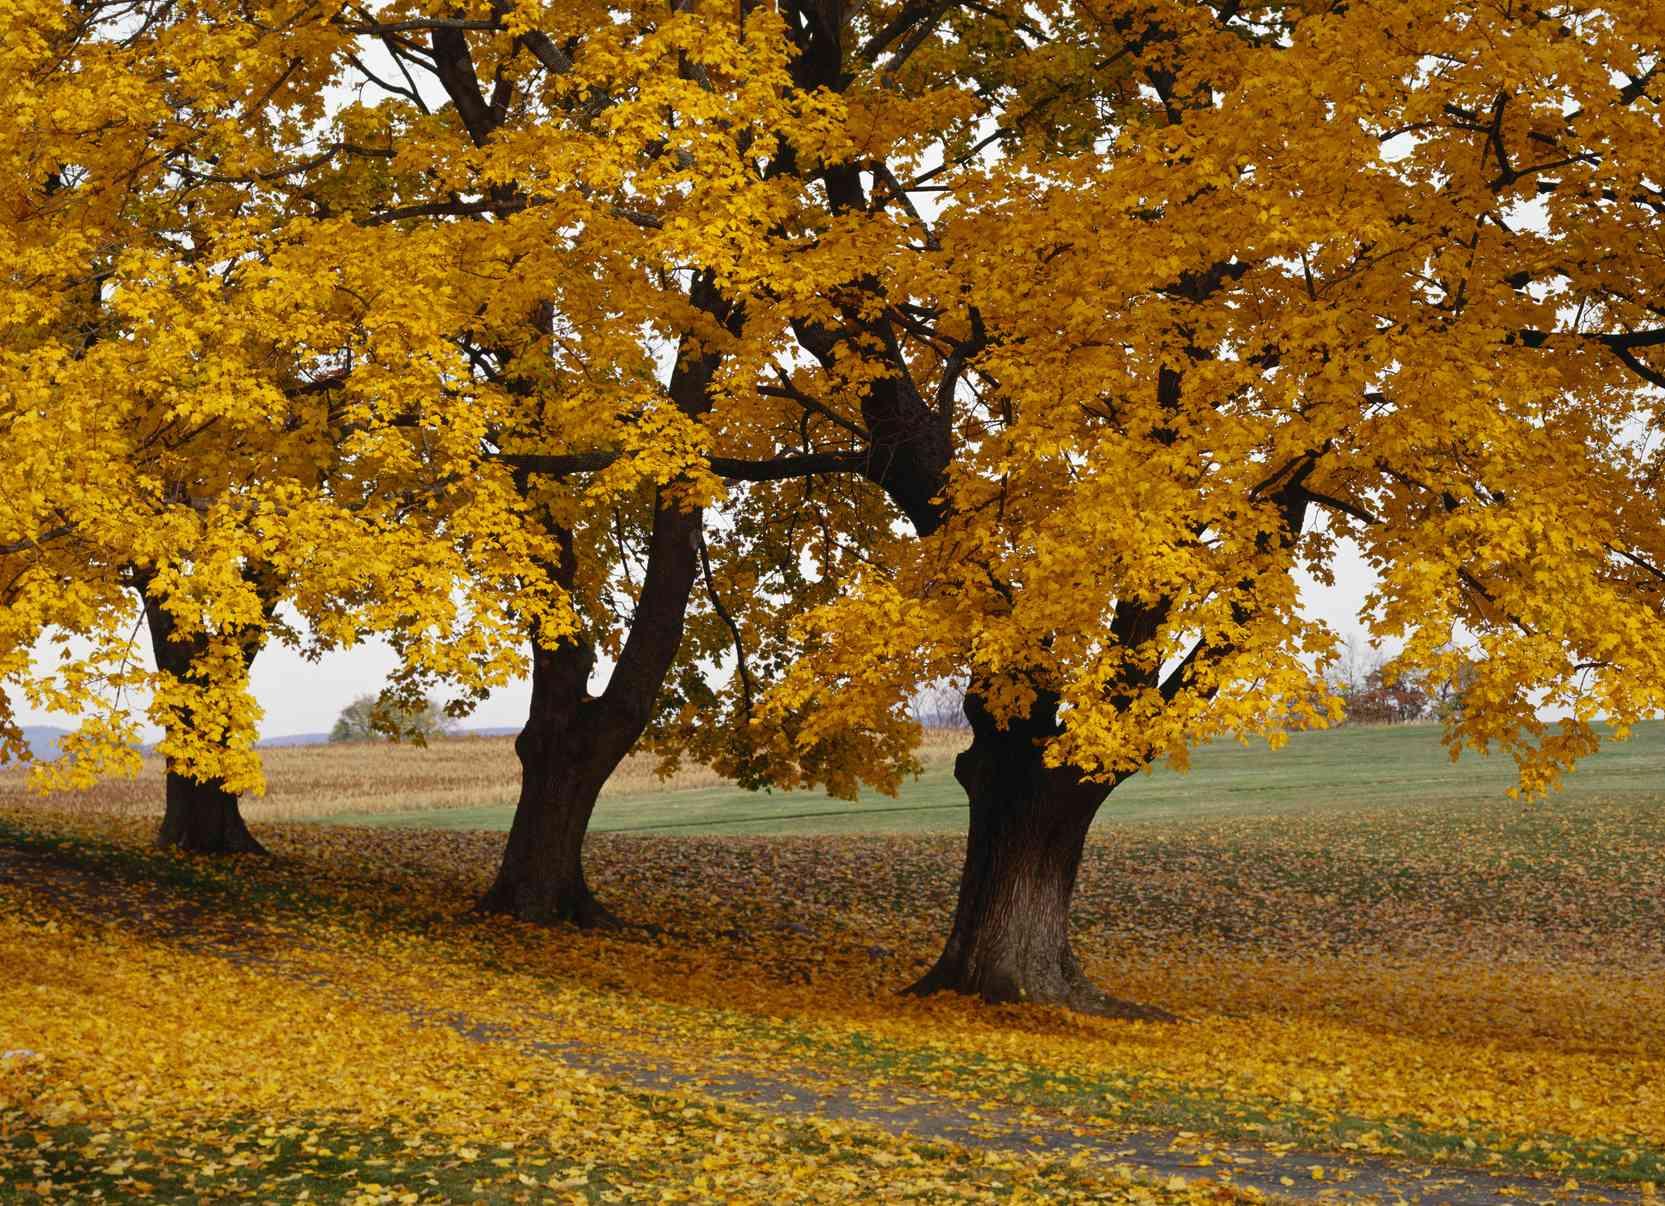 Boxelder trees turning orange in the fall.